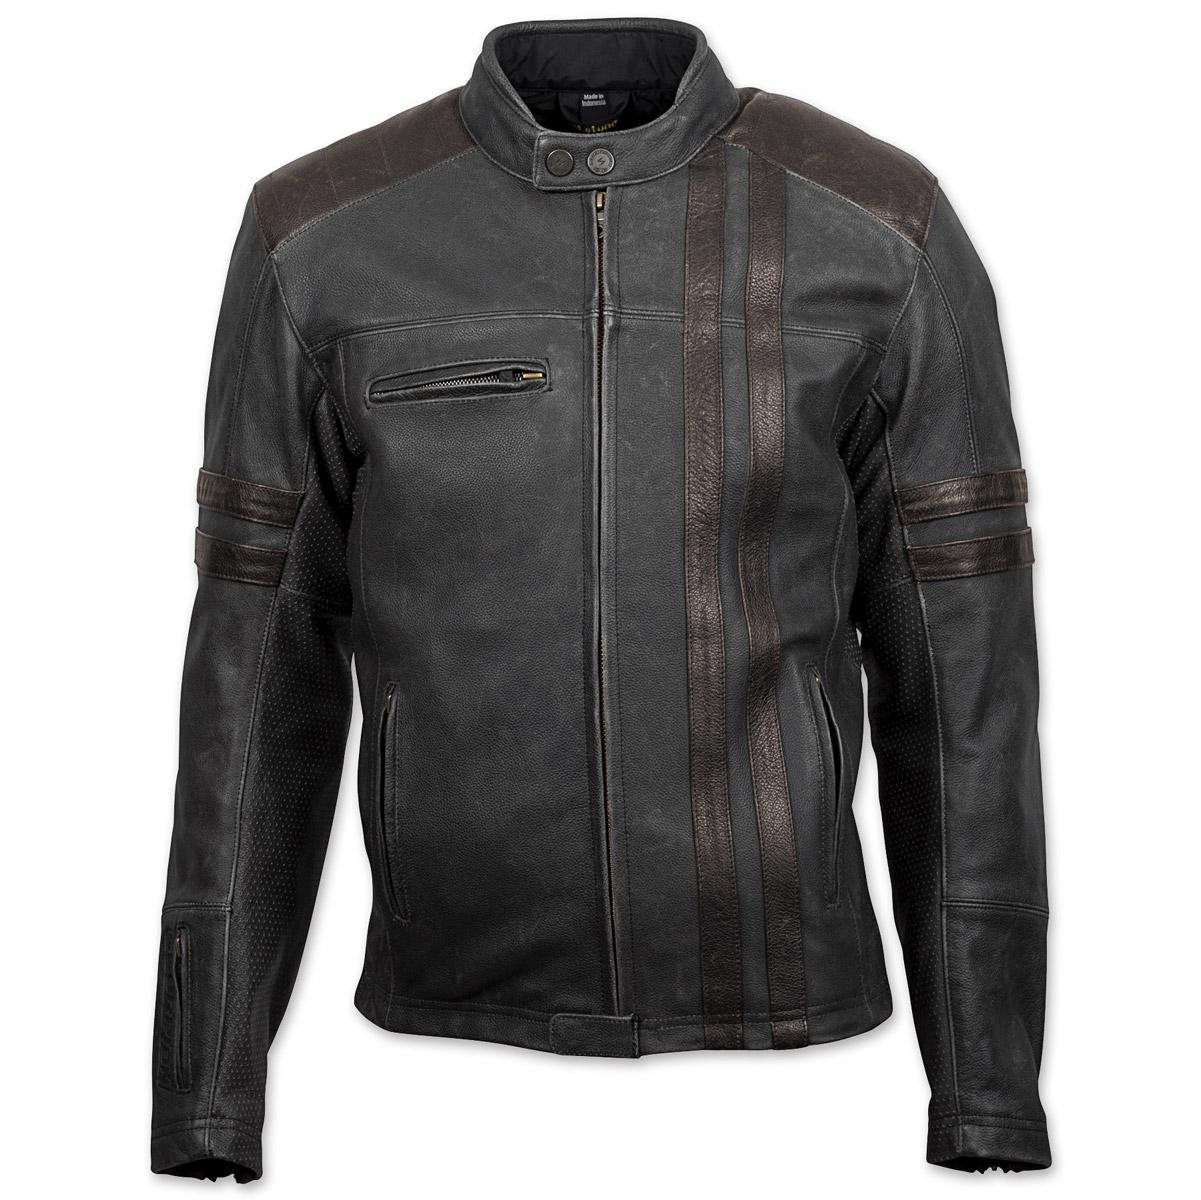 Scorpion EXO Men's 1909 Distressed Black Leather Jacket